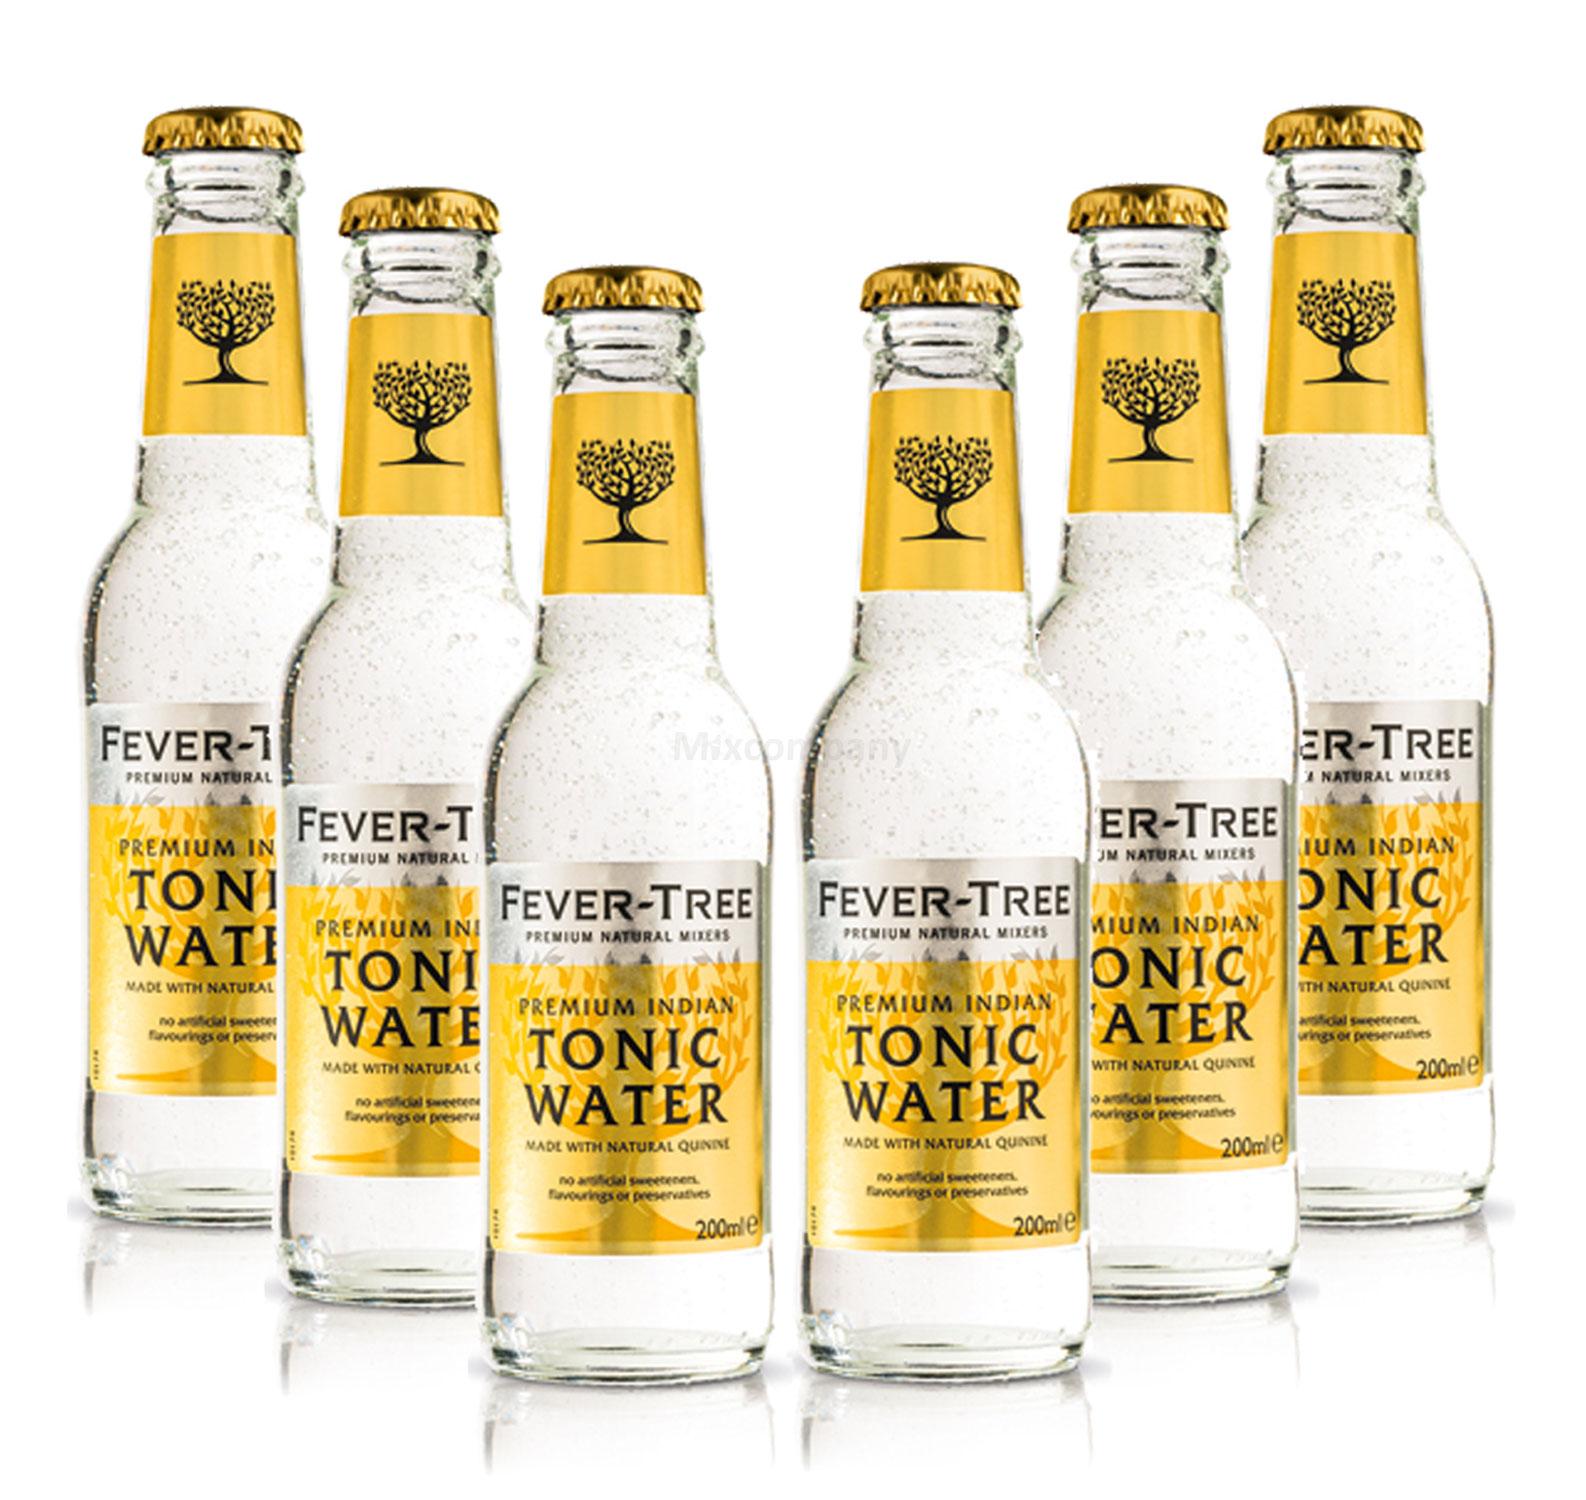 Fever-Tree Tonic Water Set - 6x 200ml inkl. Pfand MEHRWEG